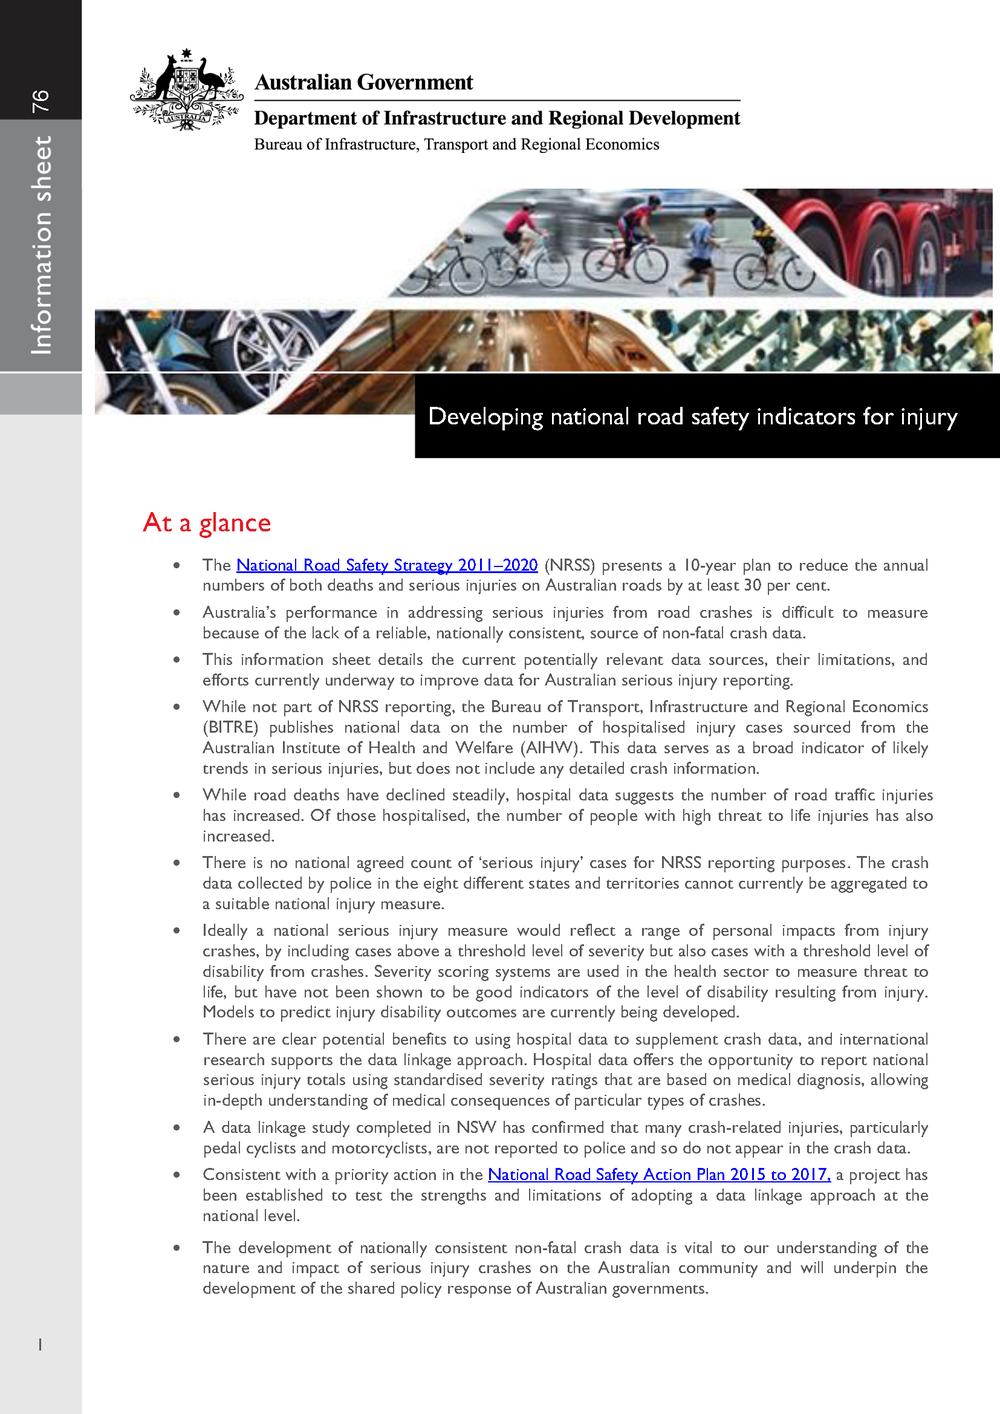 BITRE report using ATR.png